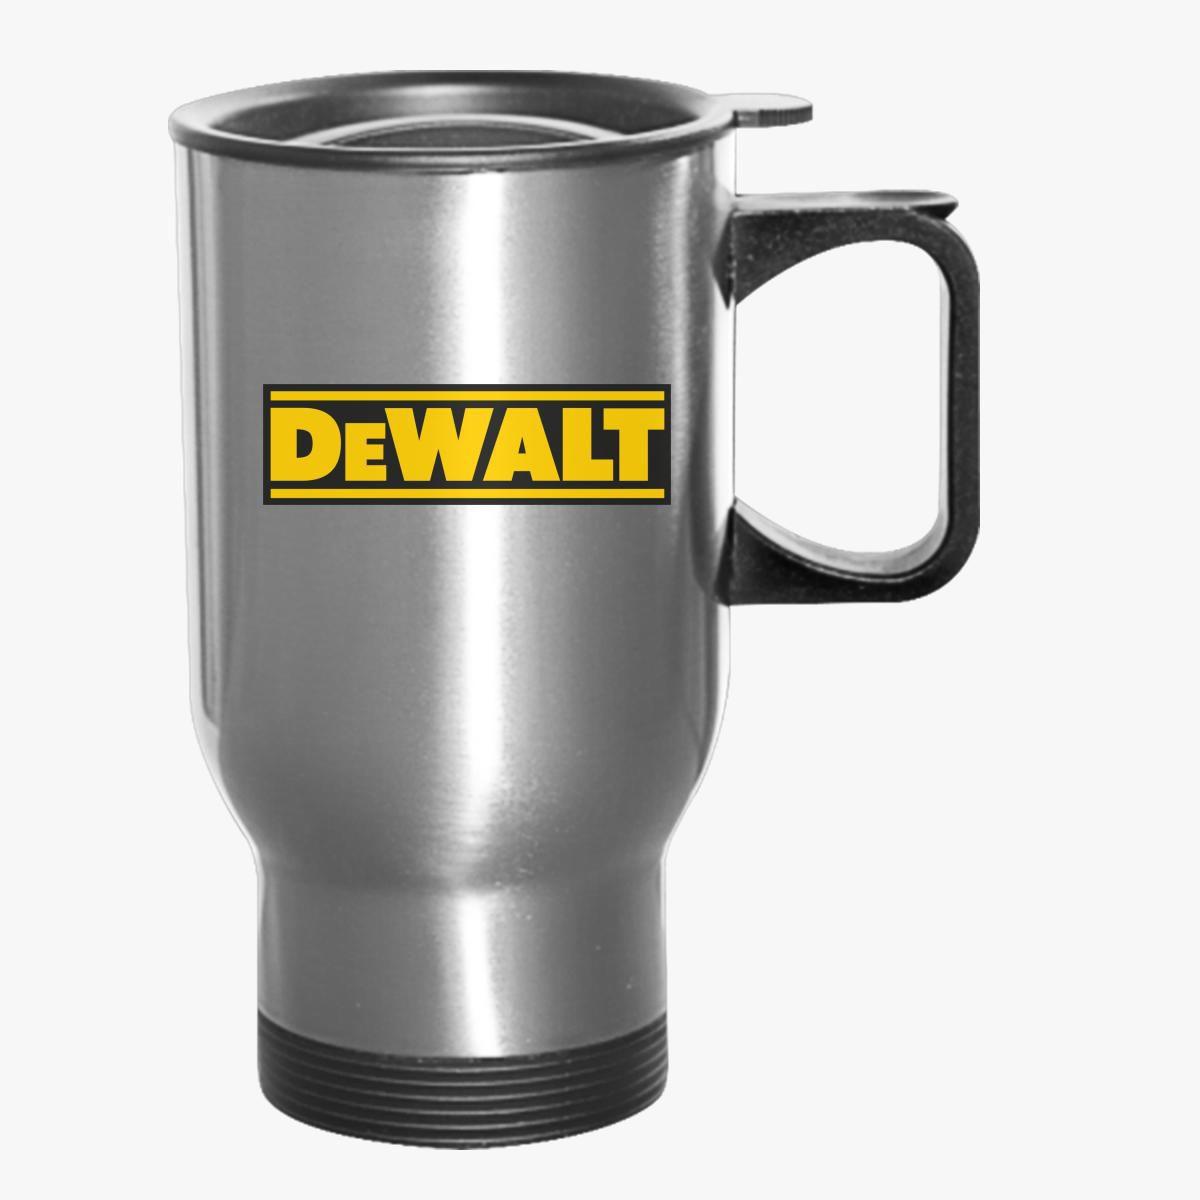 c1fec9a94d8 DeWALT Logo Travel Mug - Customon